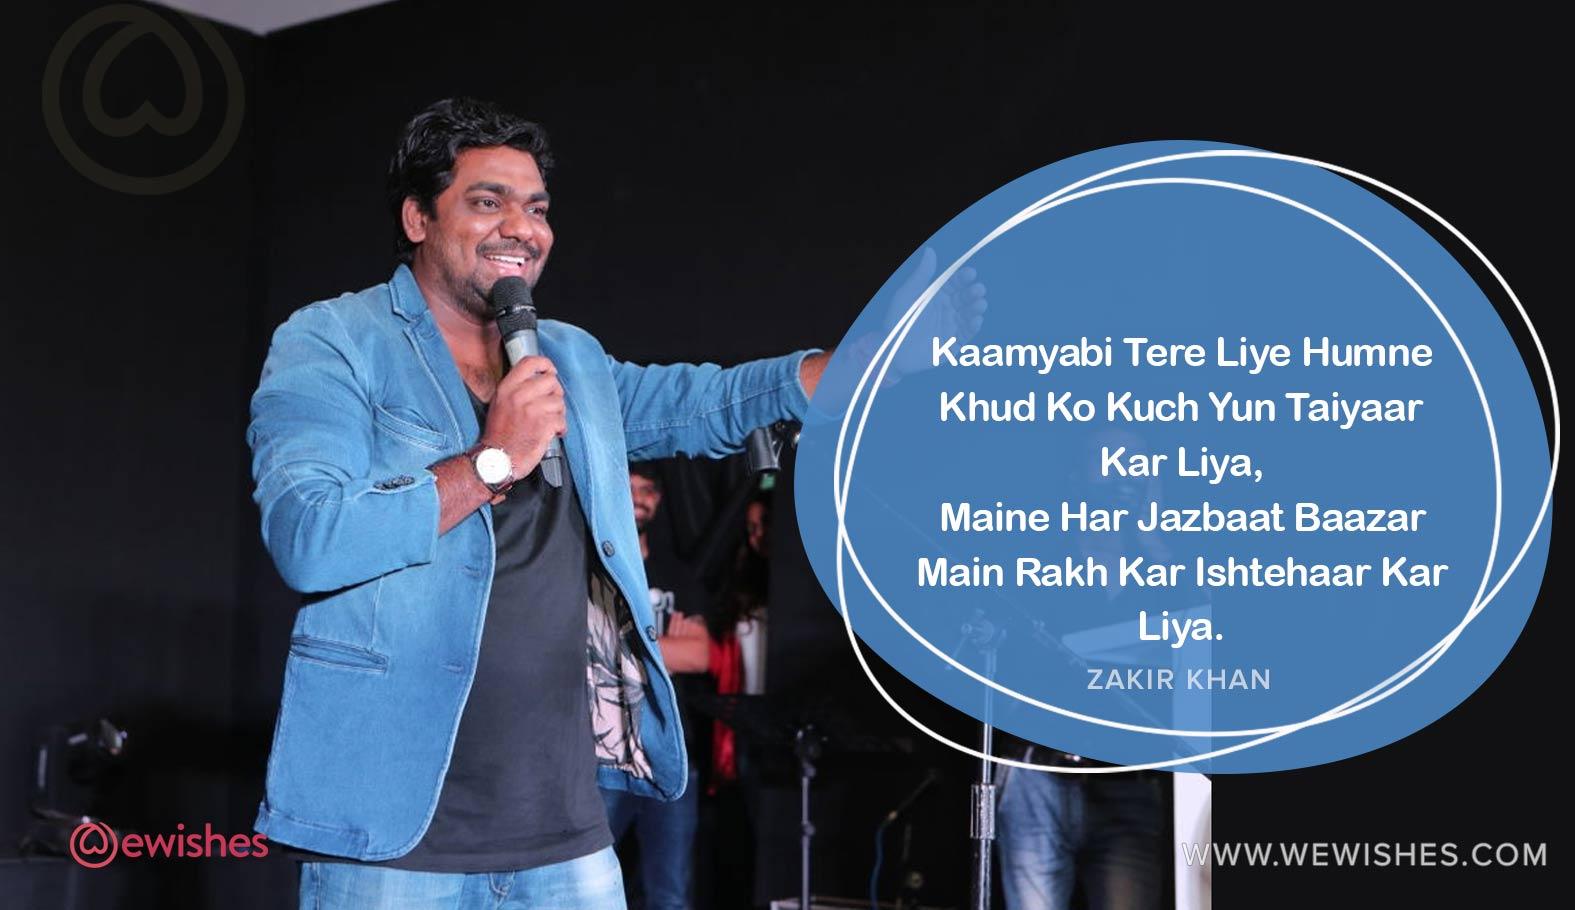 Zakir khan success quote